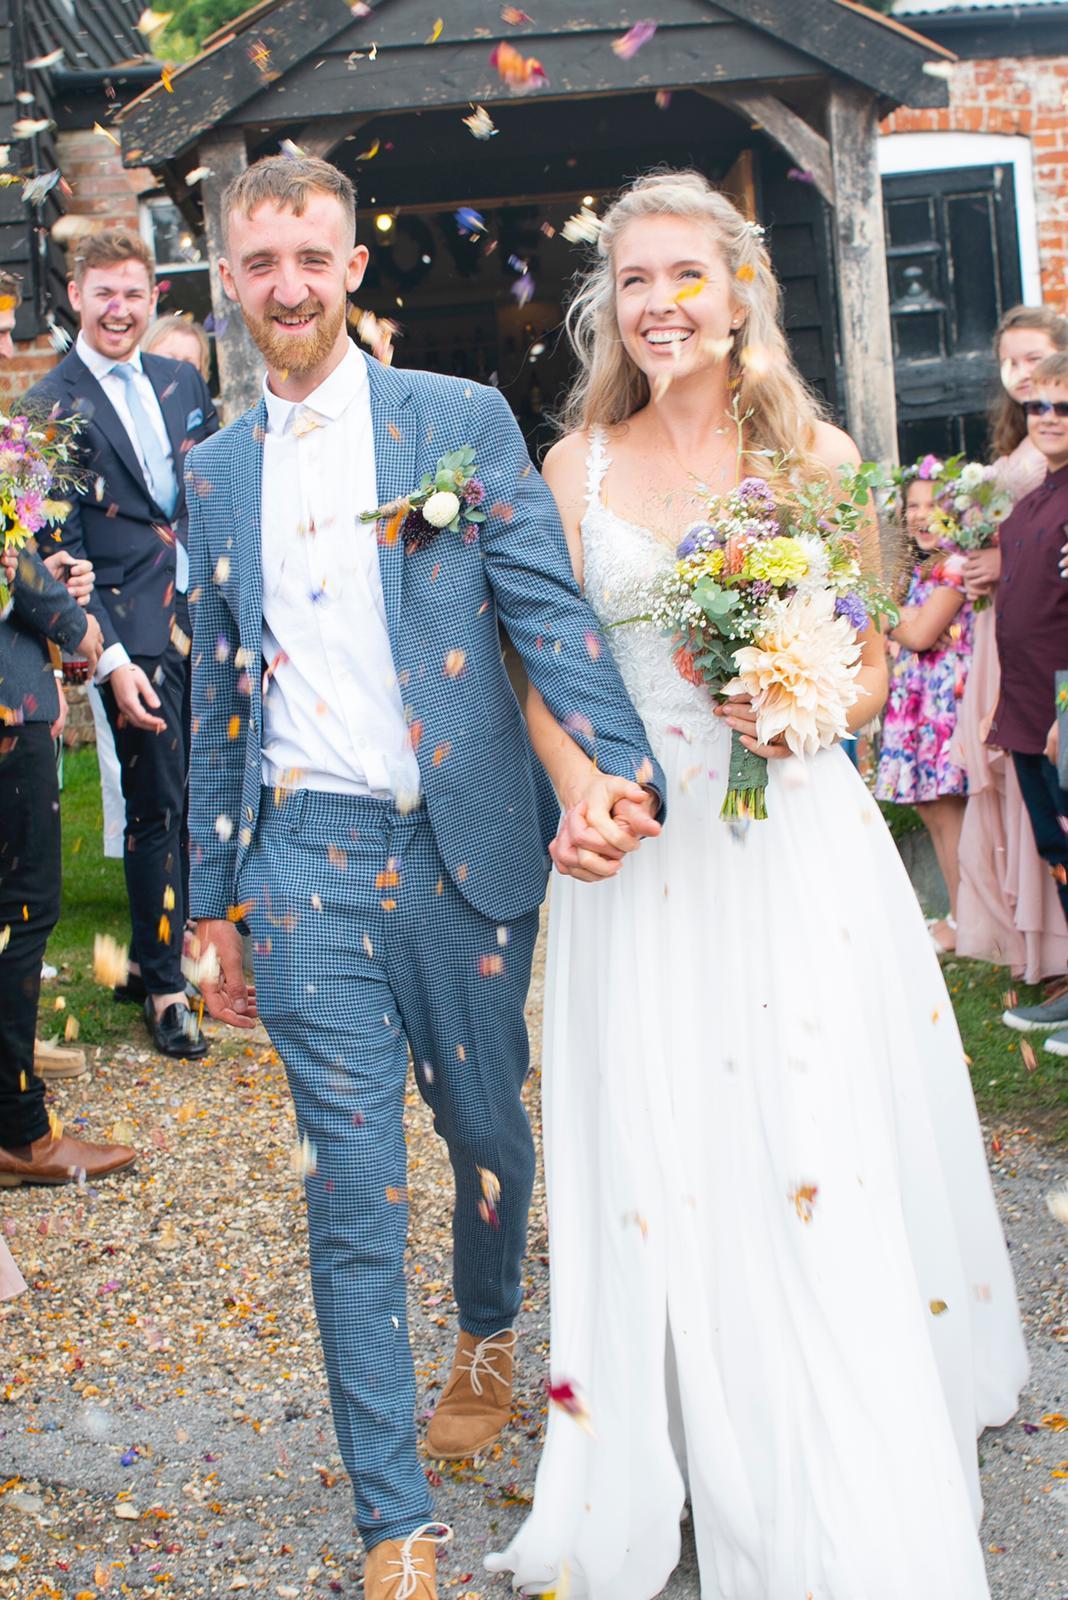 Salisbury newlyweds grow allotment flowers - for their wedding!